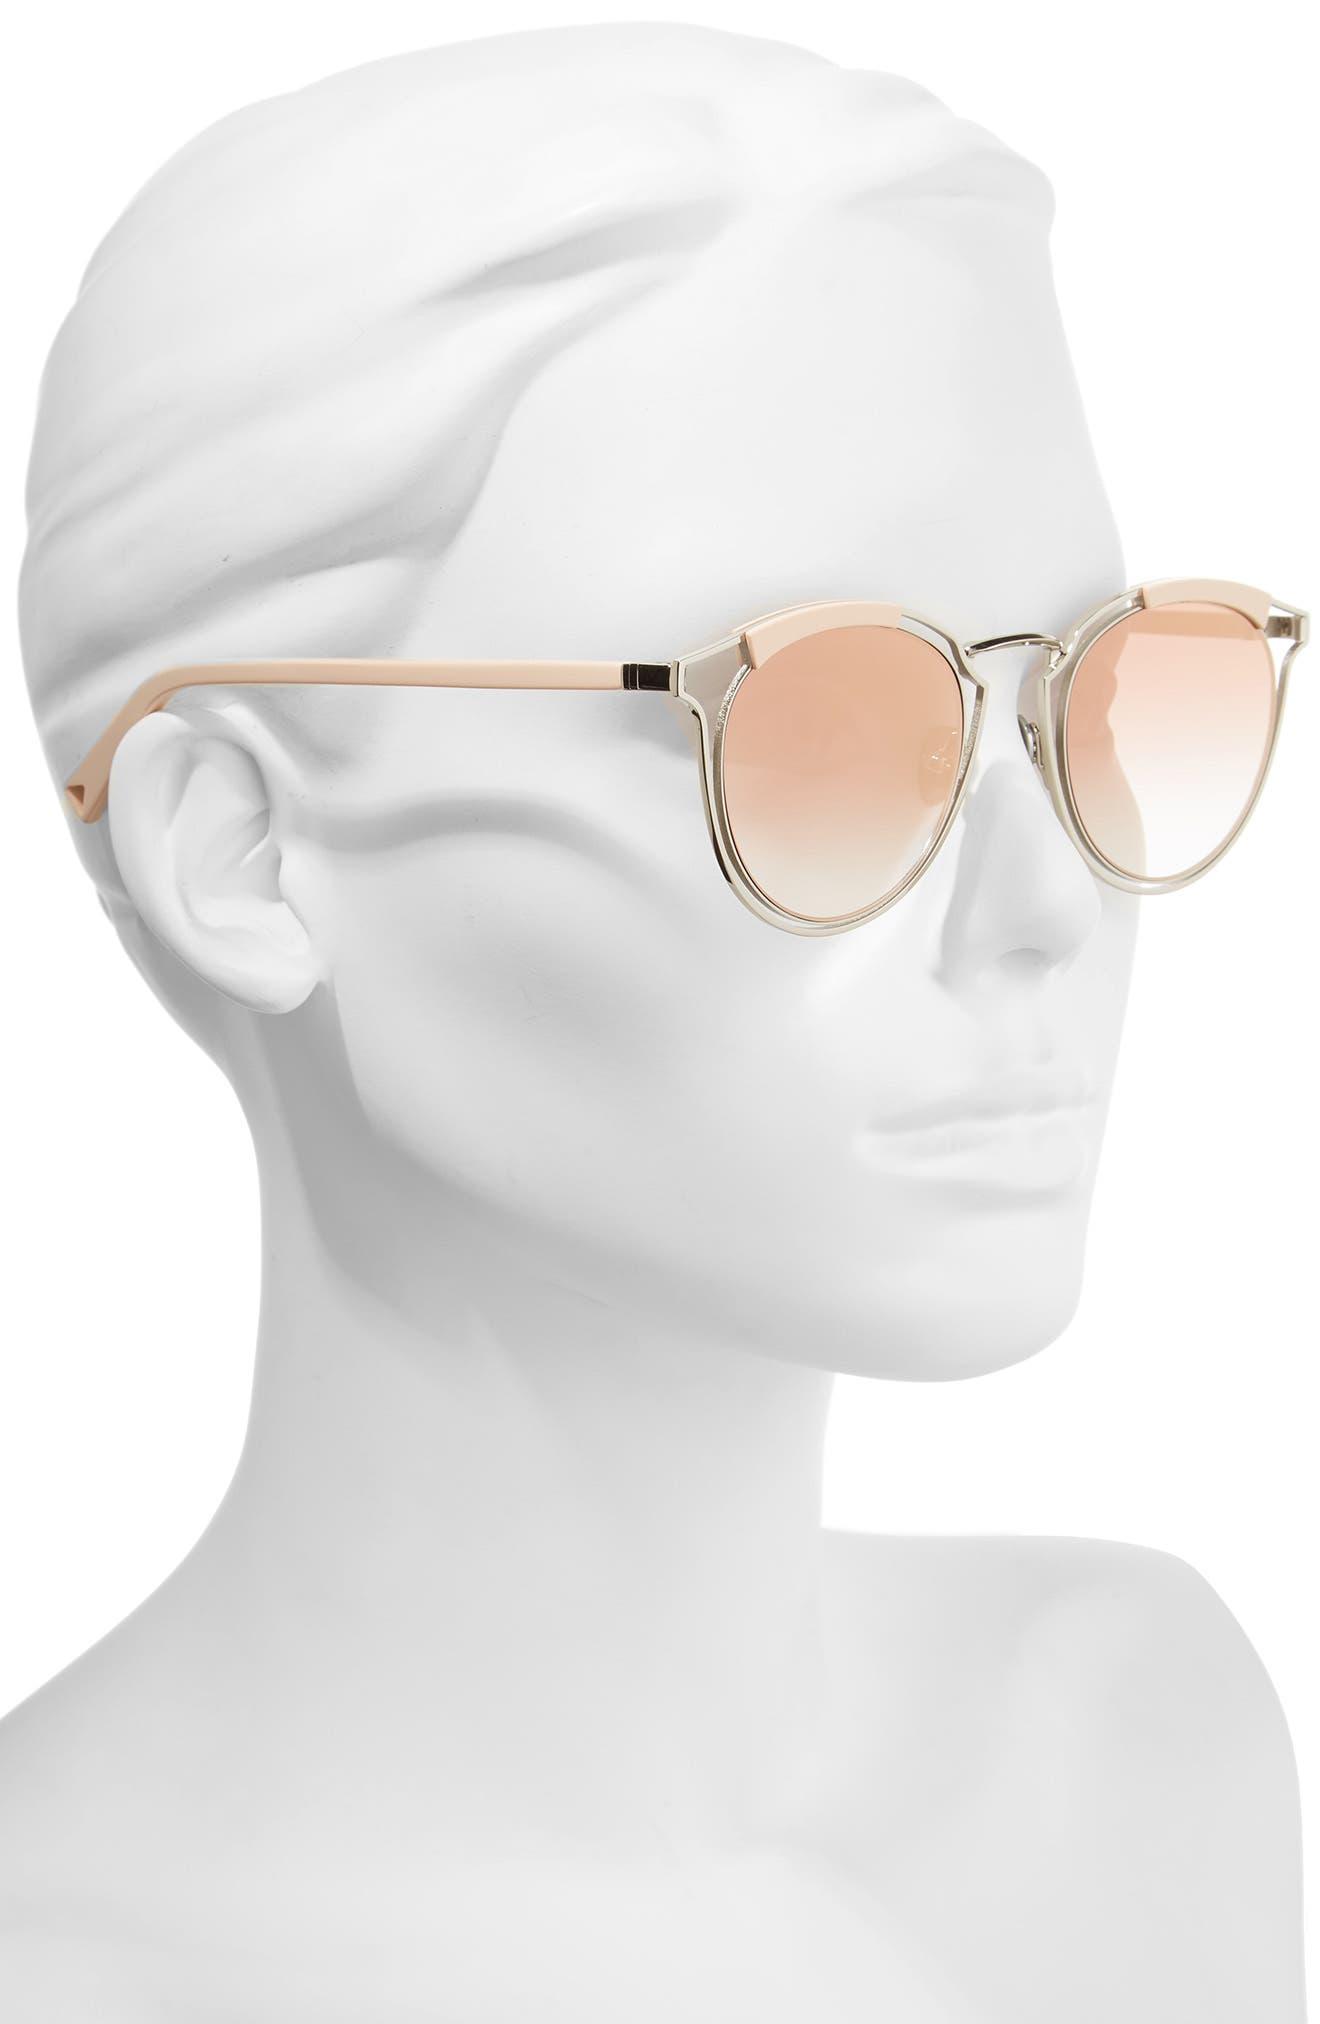 Edge X 50mm Modified Round Sunglasses,                             Alternate thumbnail 2, color,                             040